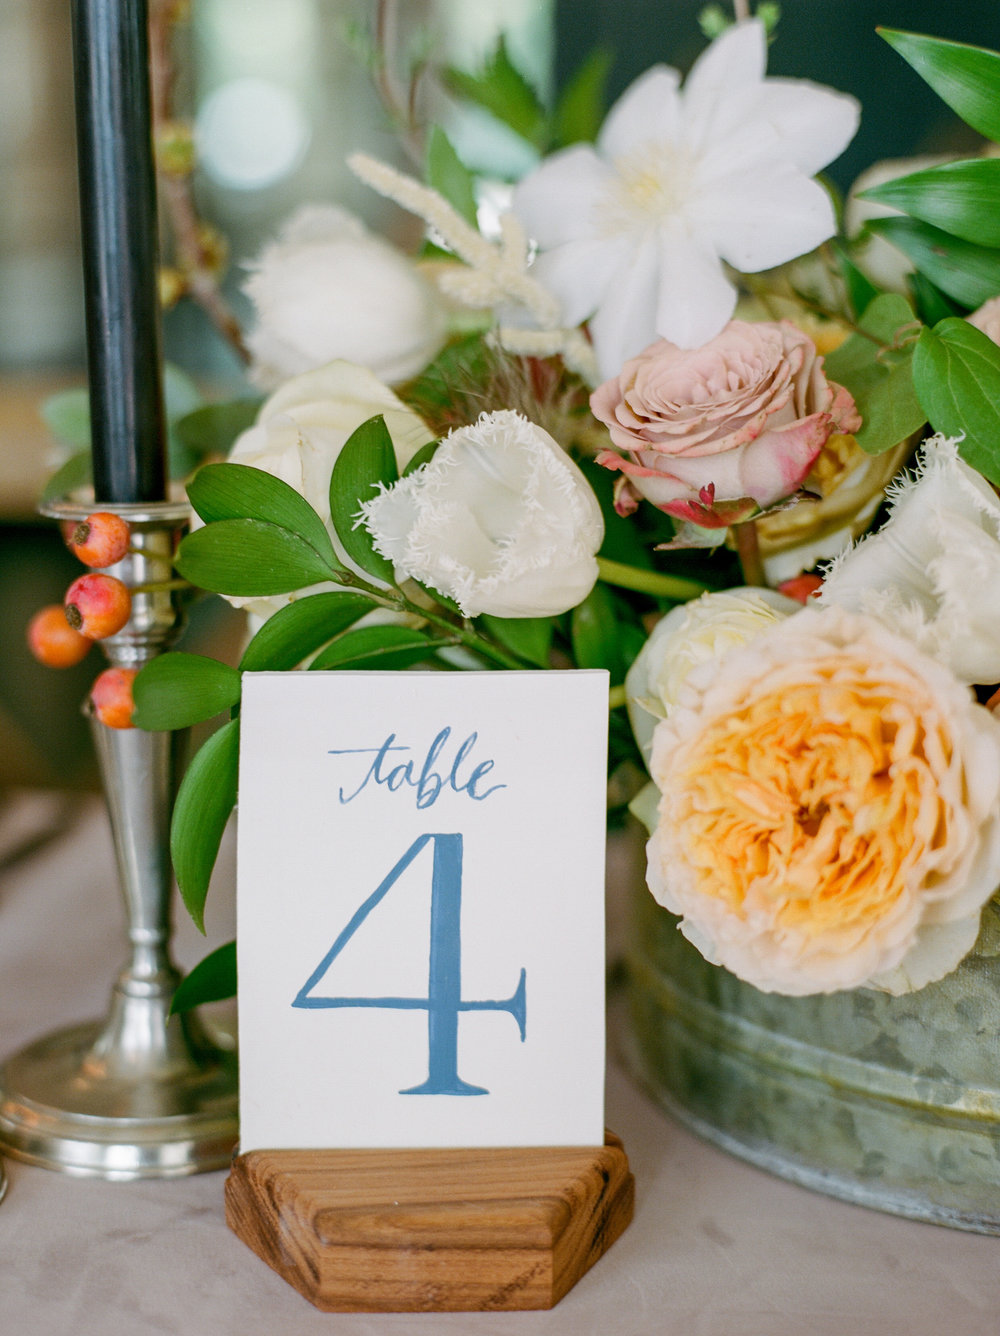 Spring Wedding at Station 51 - Photography: Josh and Dana FernandezFlorist: Lanson B. Jones Floral Co.Venue: Station 51, Houston